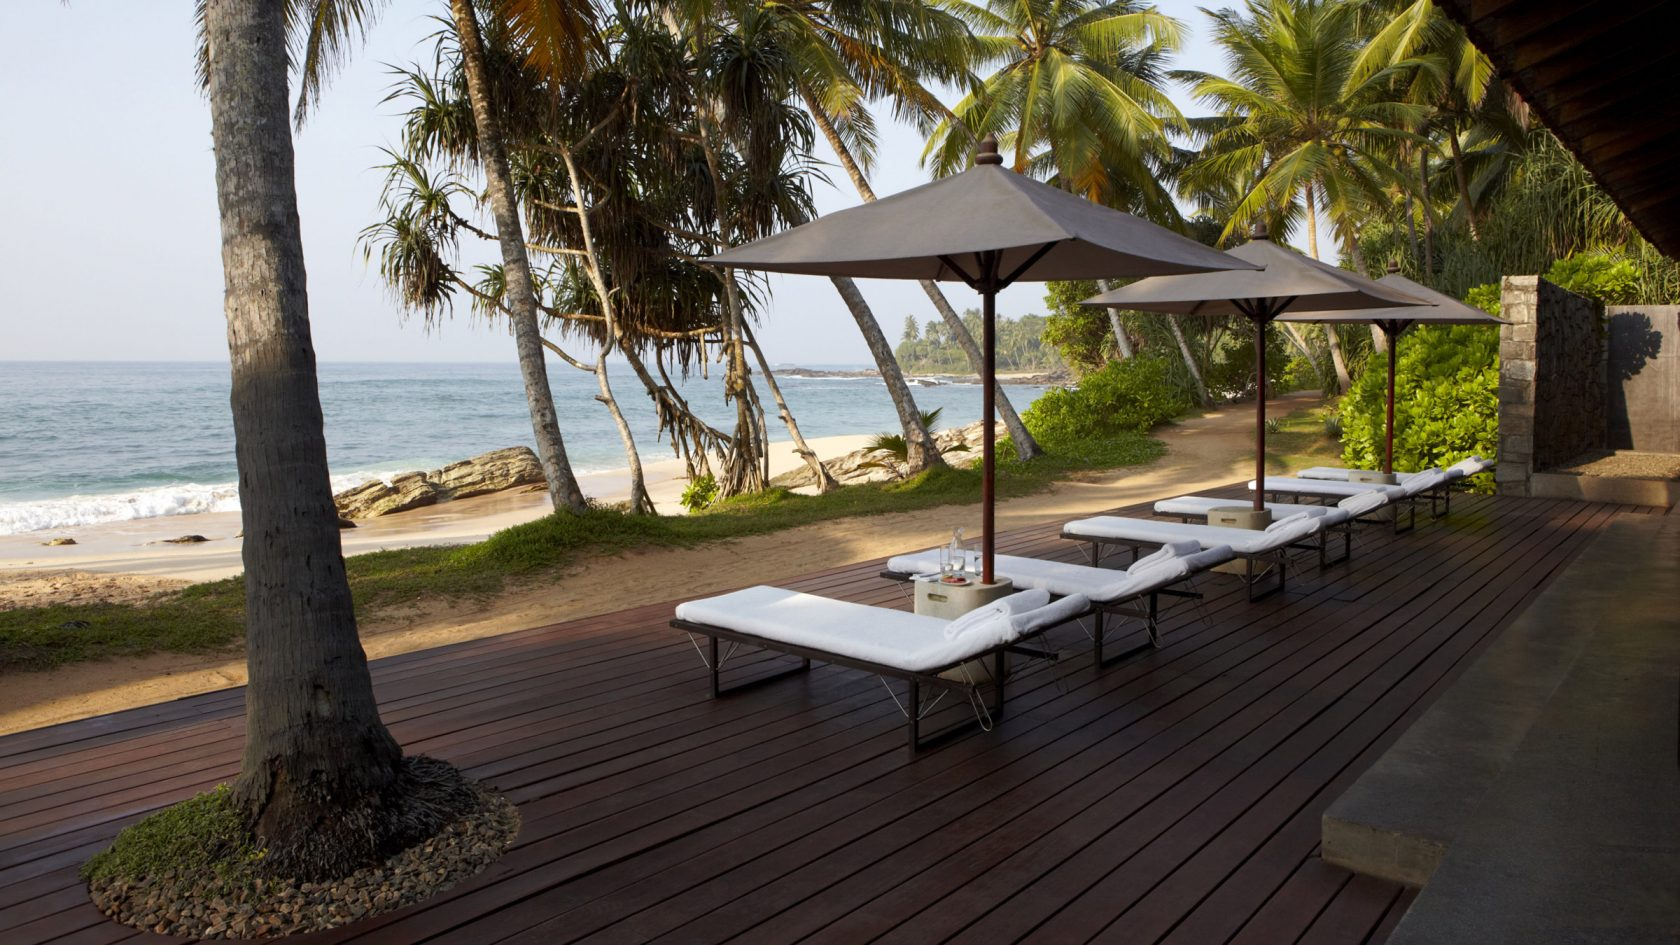 Amanwella, Sri Lanka - Beach Club